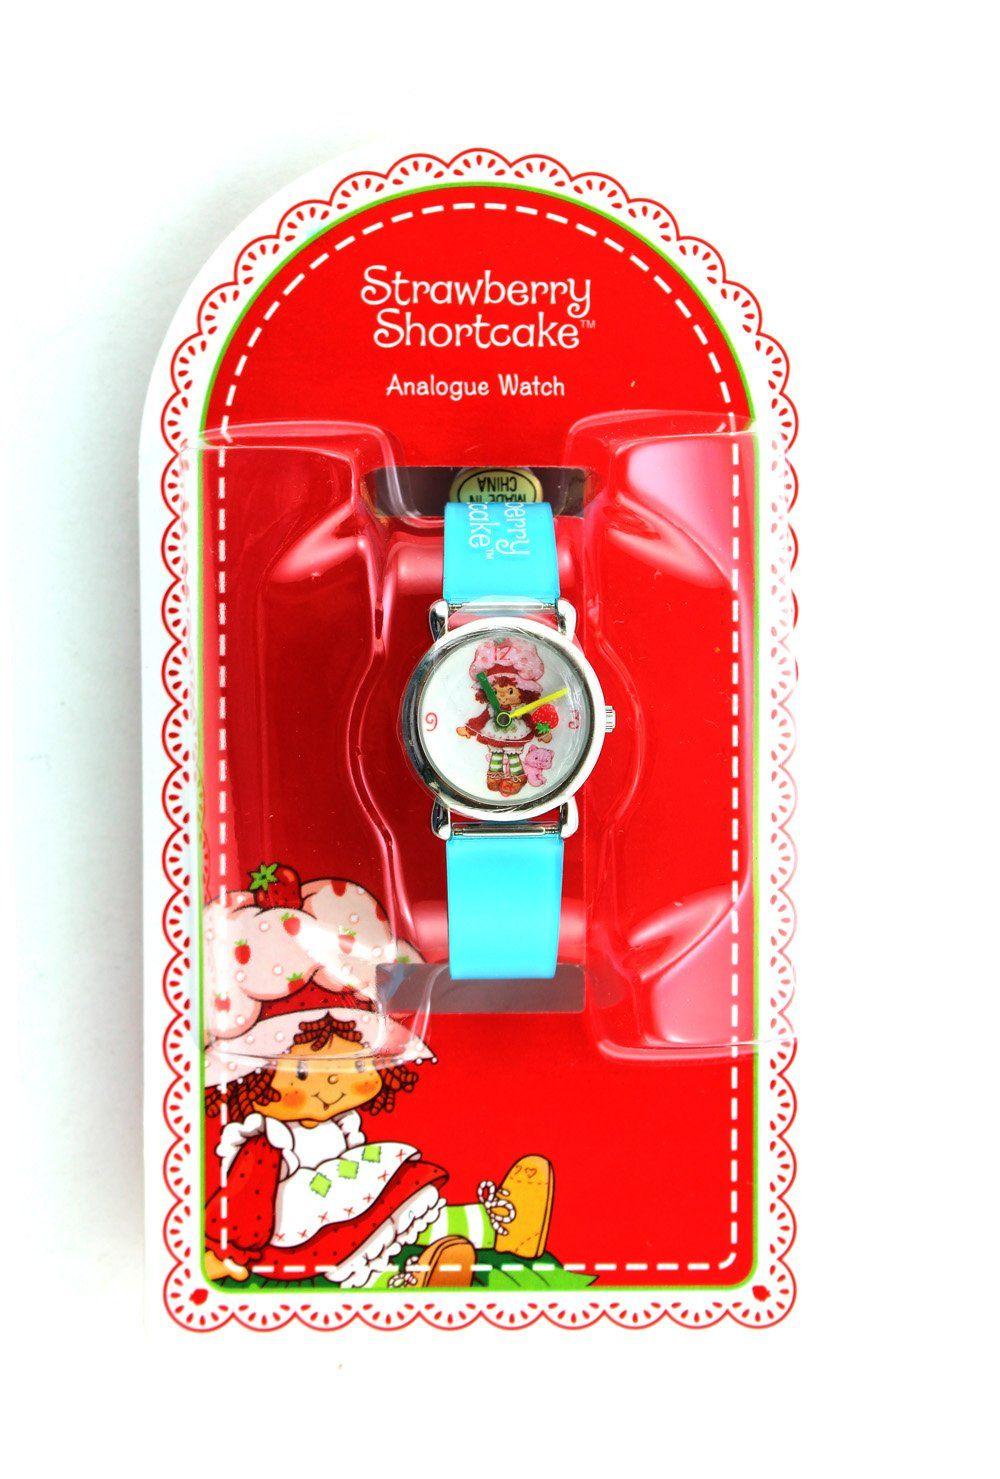 Blue band strawberry shortcake watch